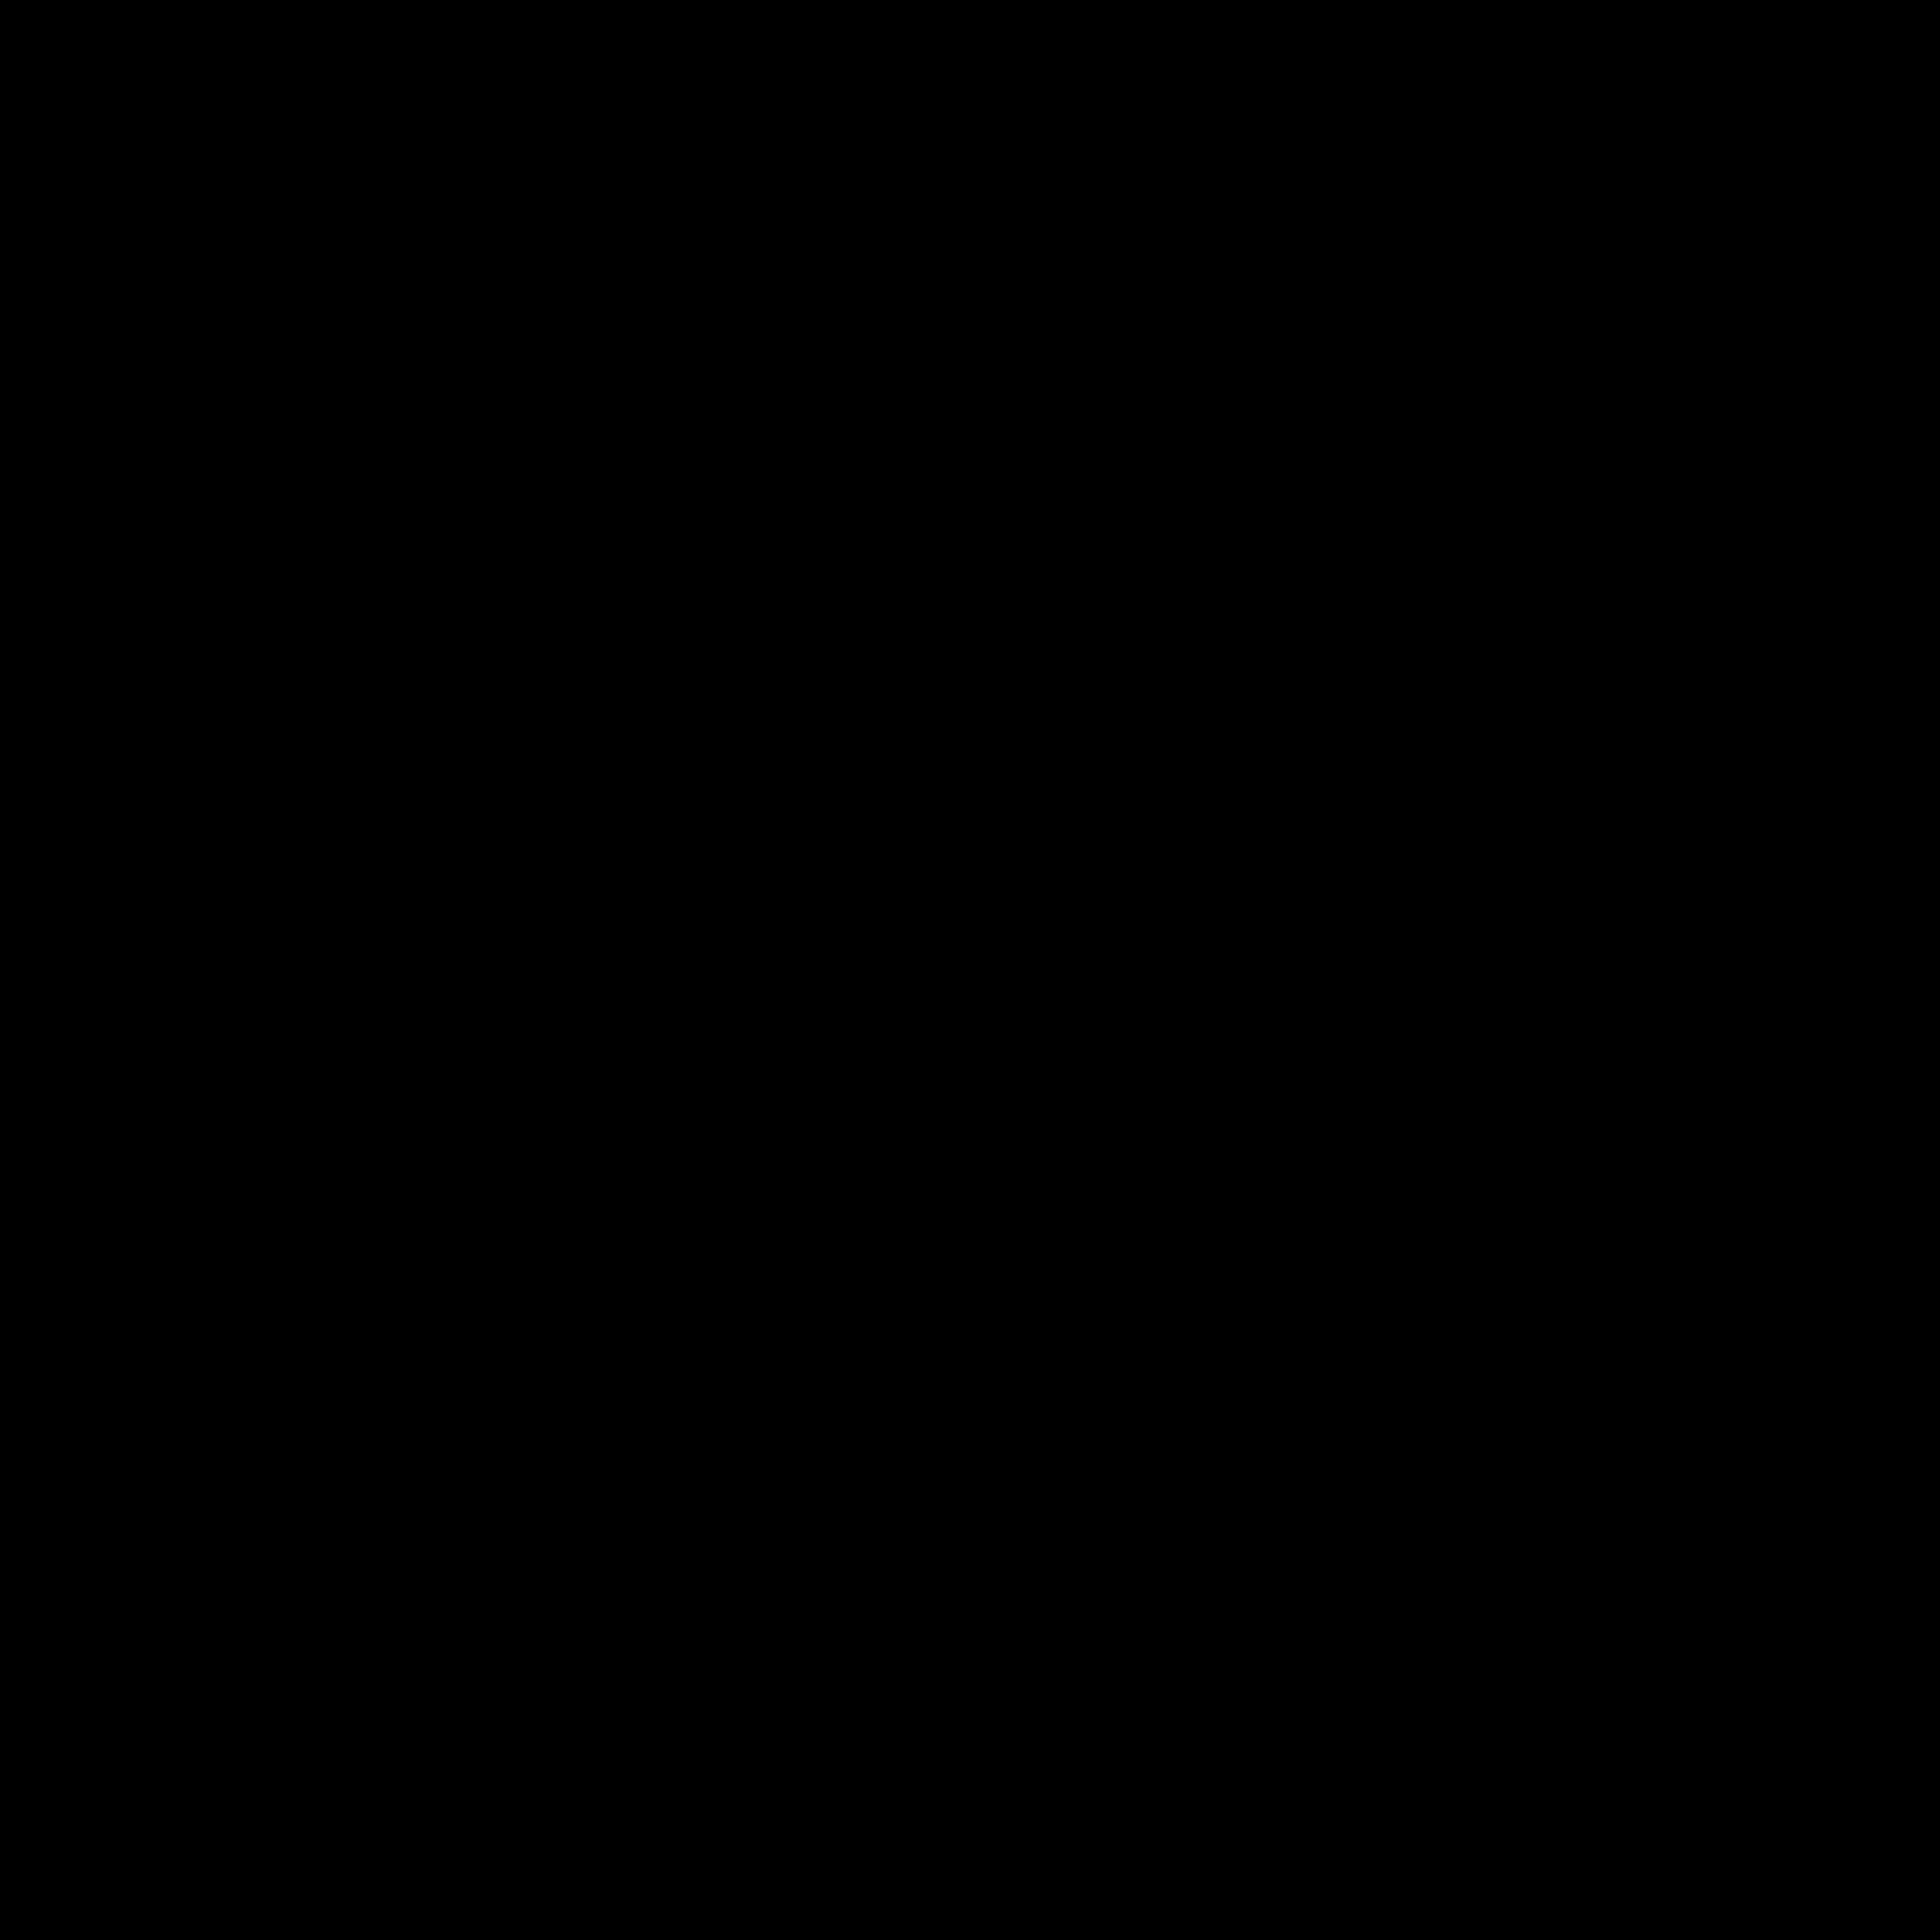 Clipart Gear Silhouette